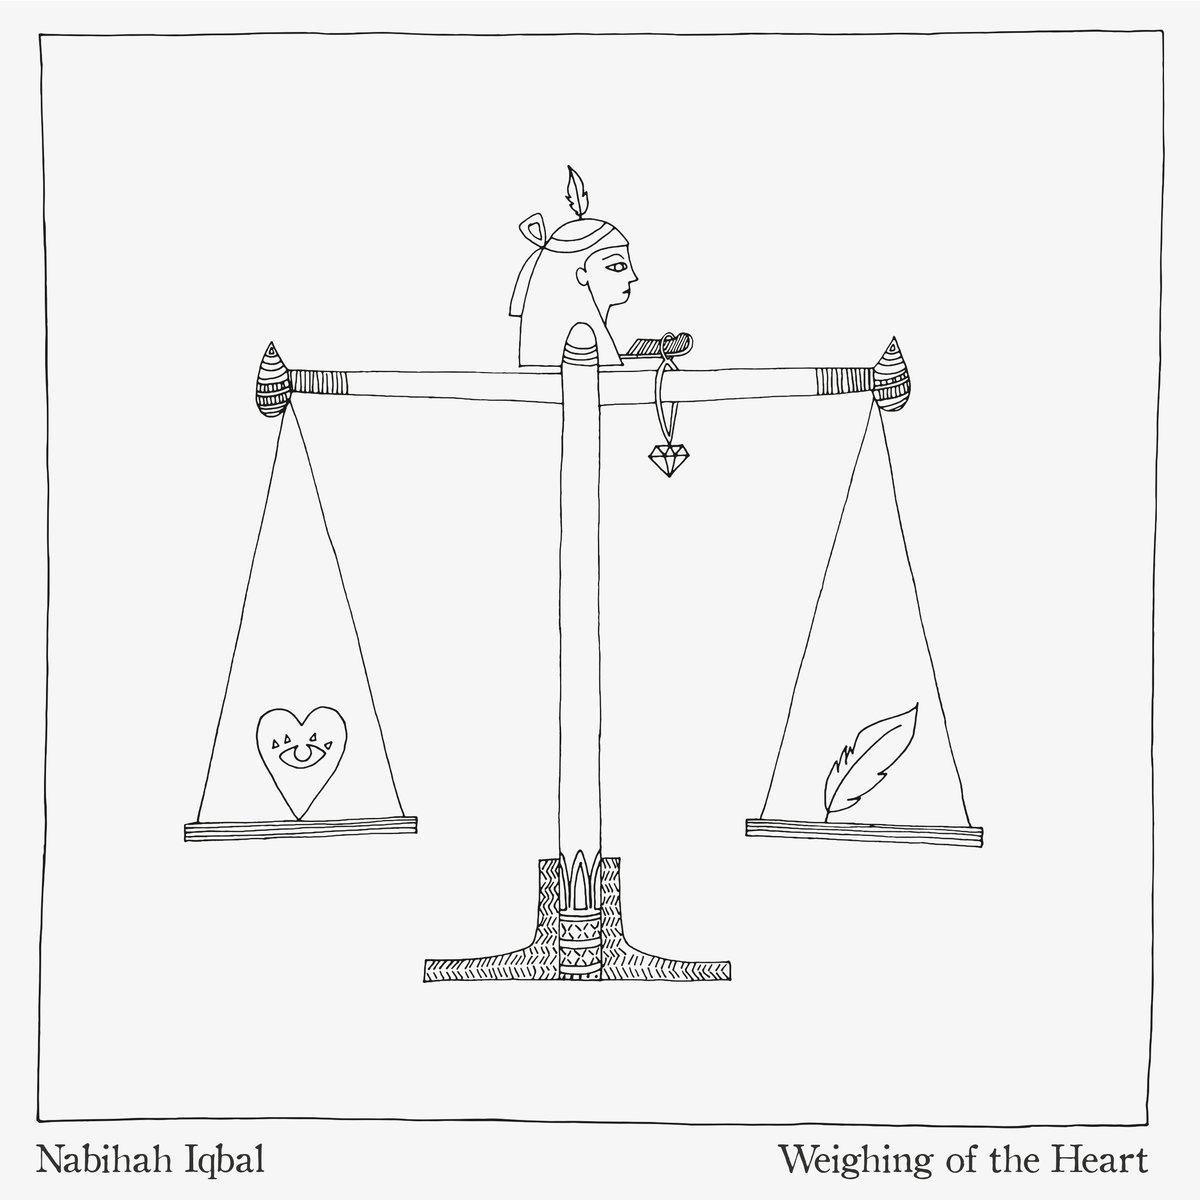 pochette de l'album Weighing of the heart de Nabihah Iqbal